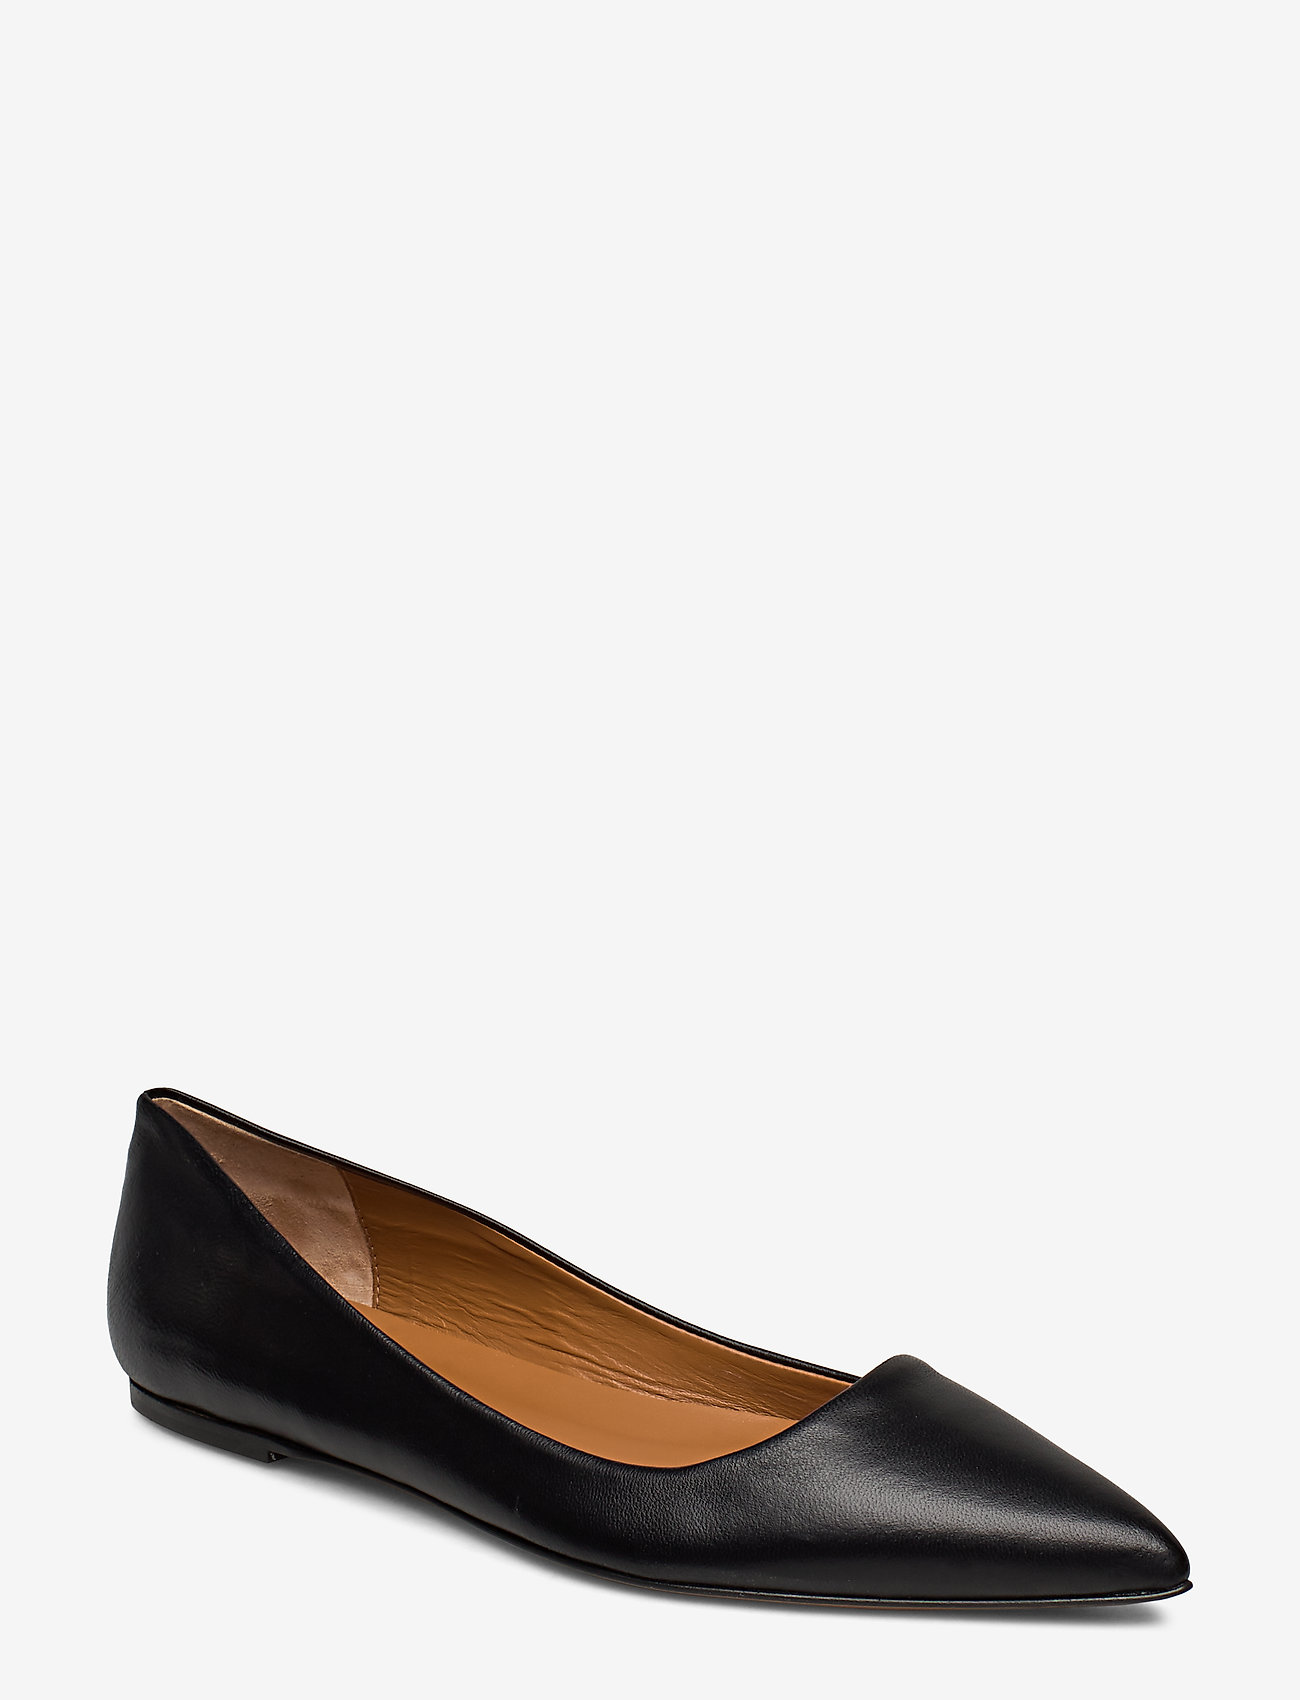 ATP Atelier - San Cataldo Black Nappa - shoes - black - 0